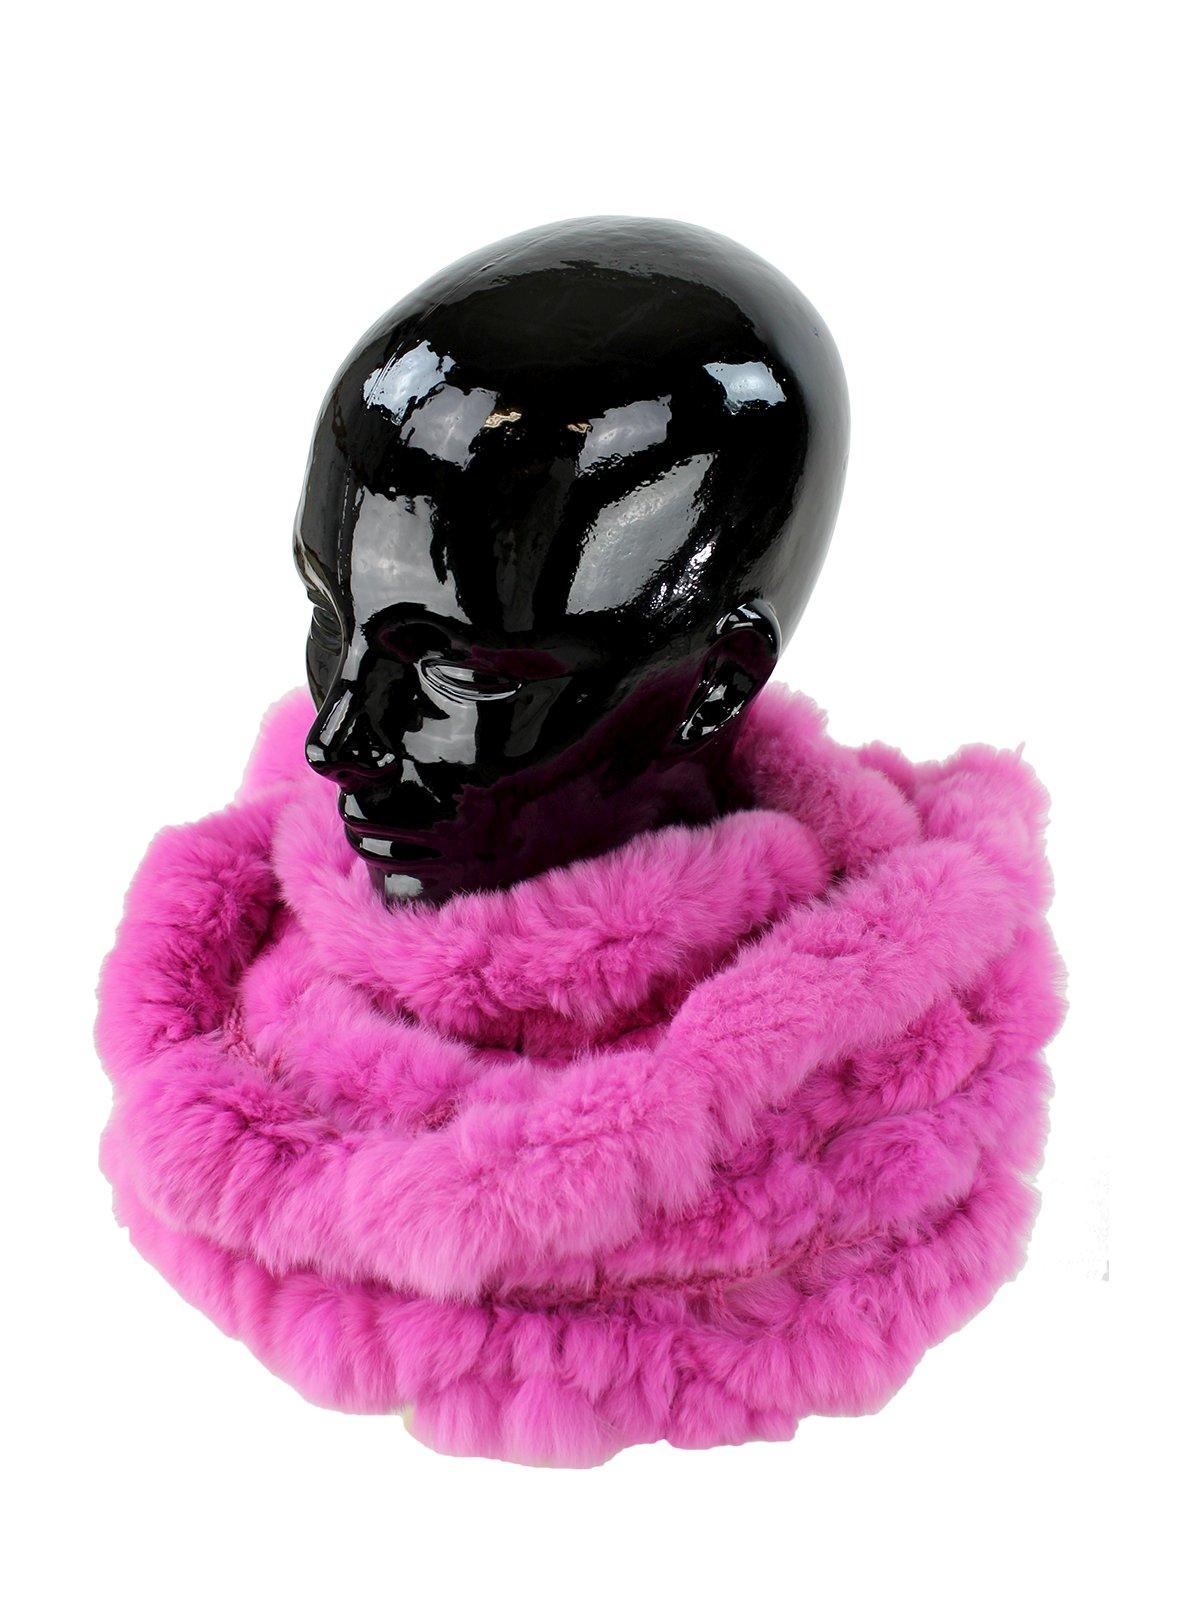 Woman's Fuschia Rex Rabbit Fur Ruffled Infinity Scarf